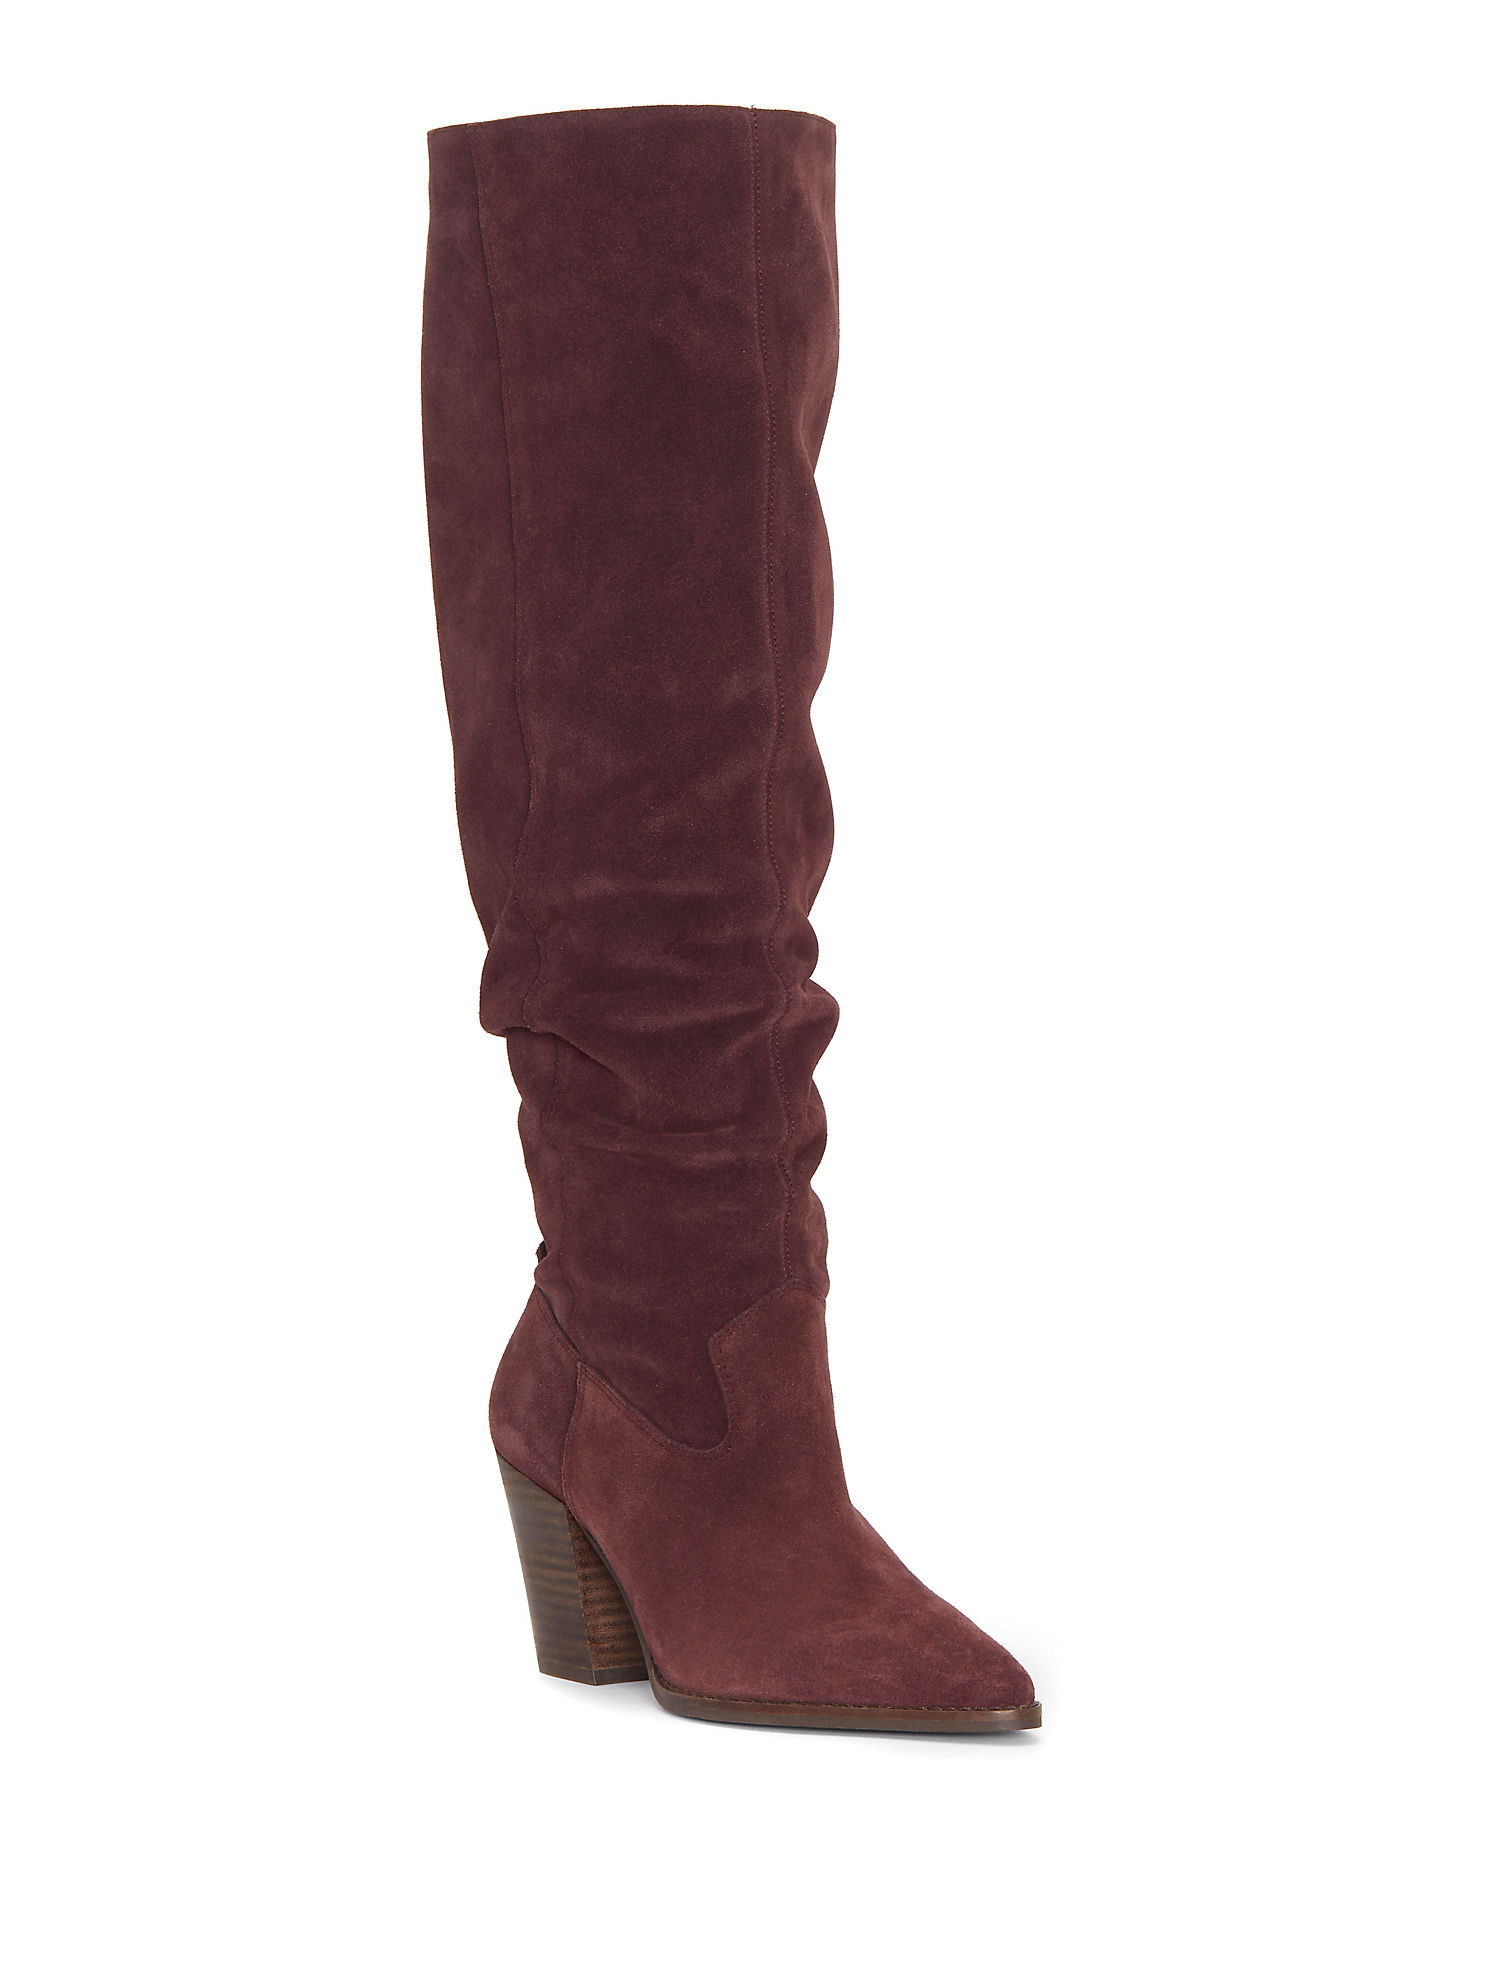 16027bb5ef4 Azoola Boot